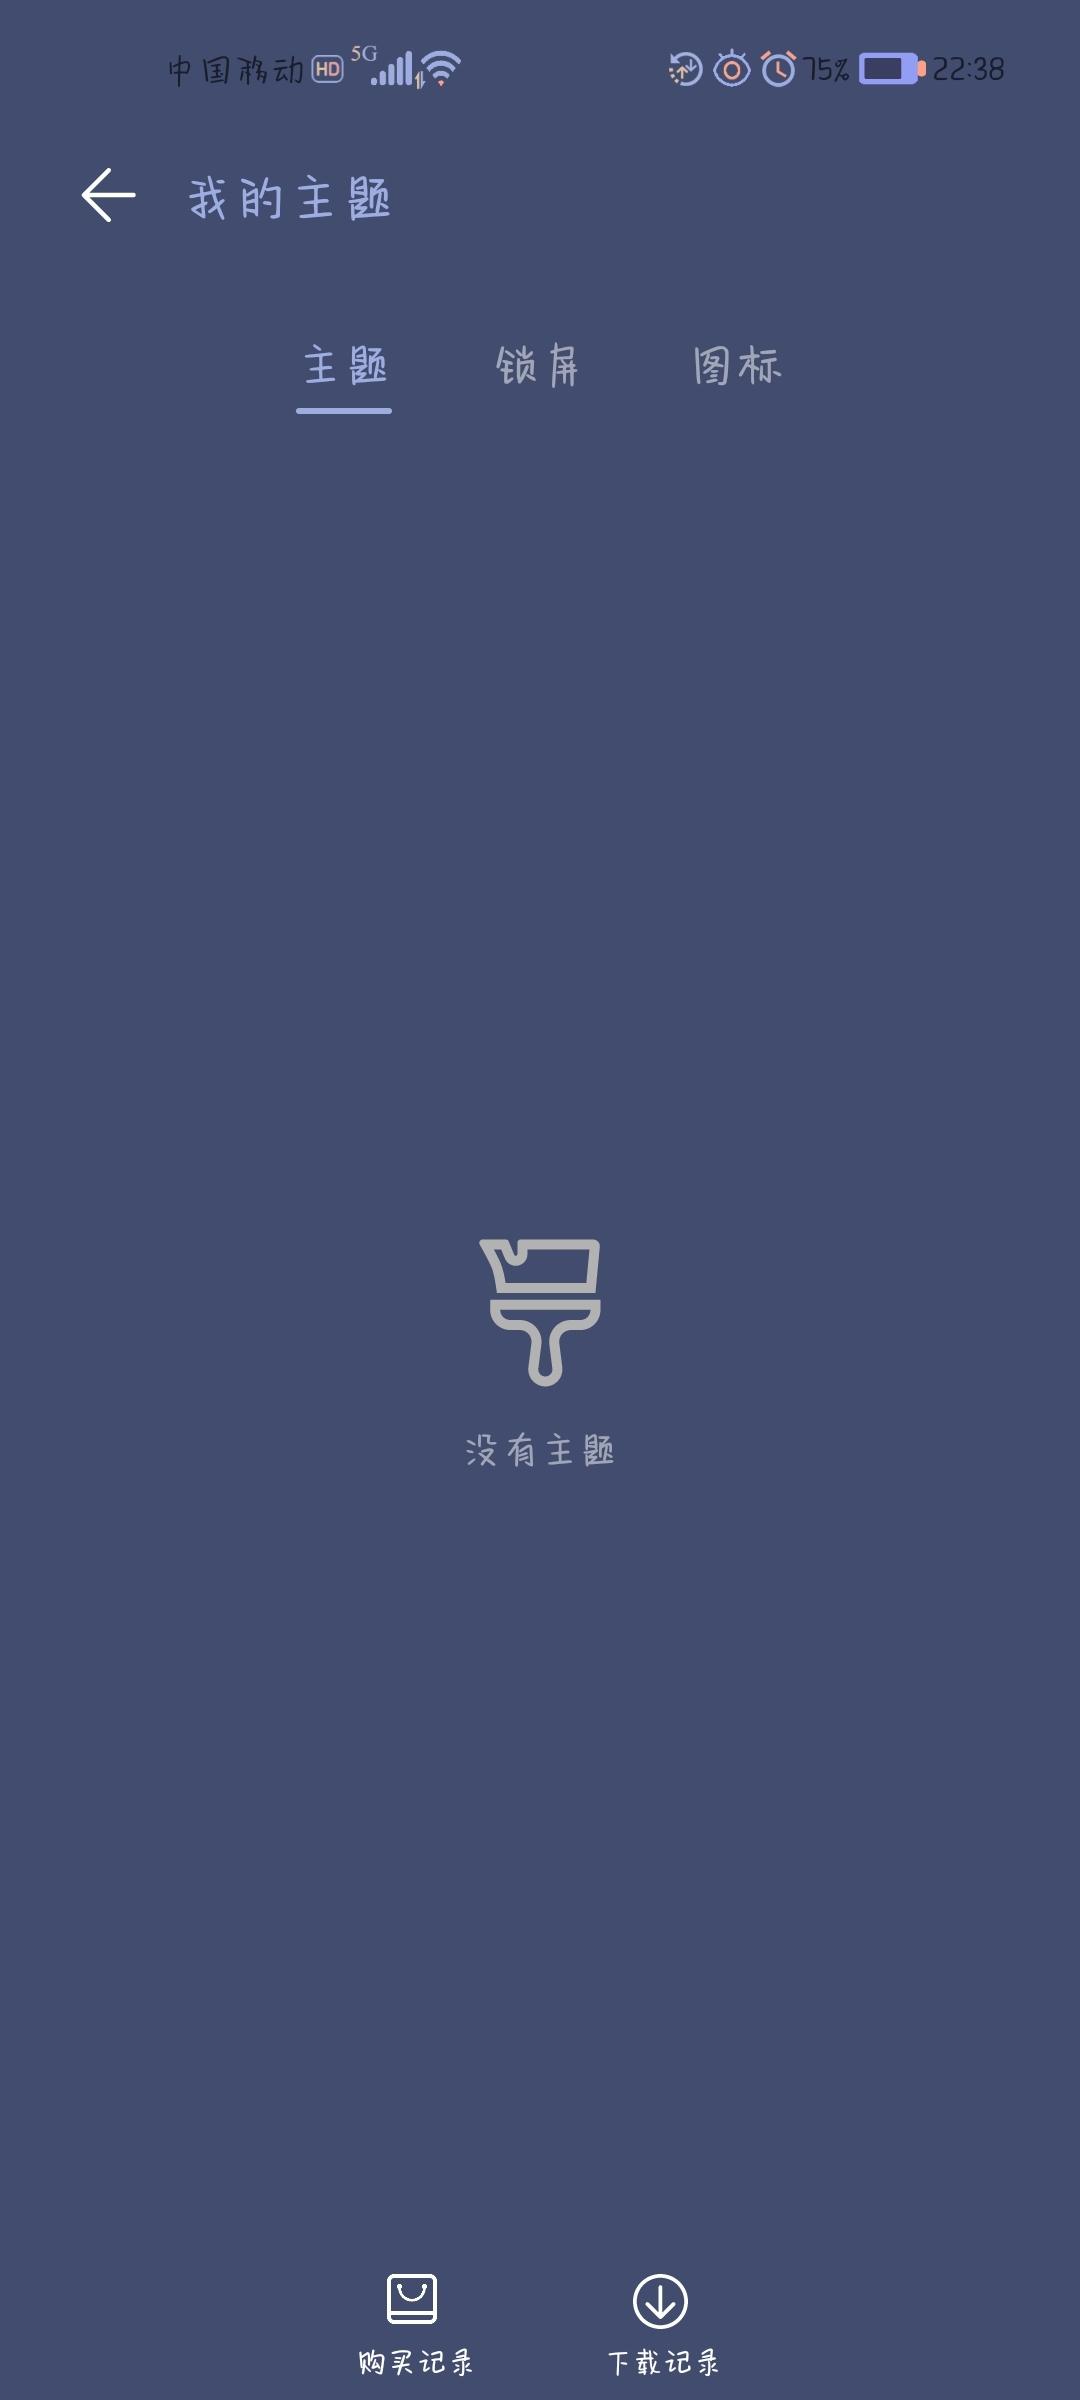 Screenshot_20200921_223853_com.huawei.android.thememanager.jpg